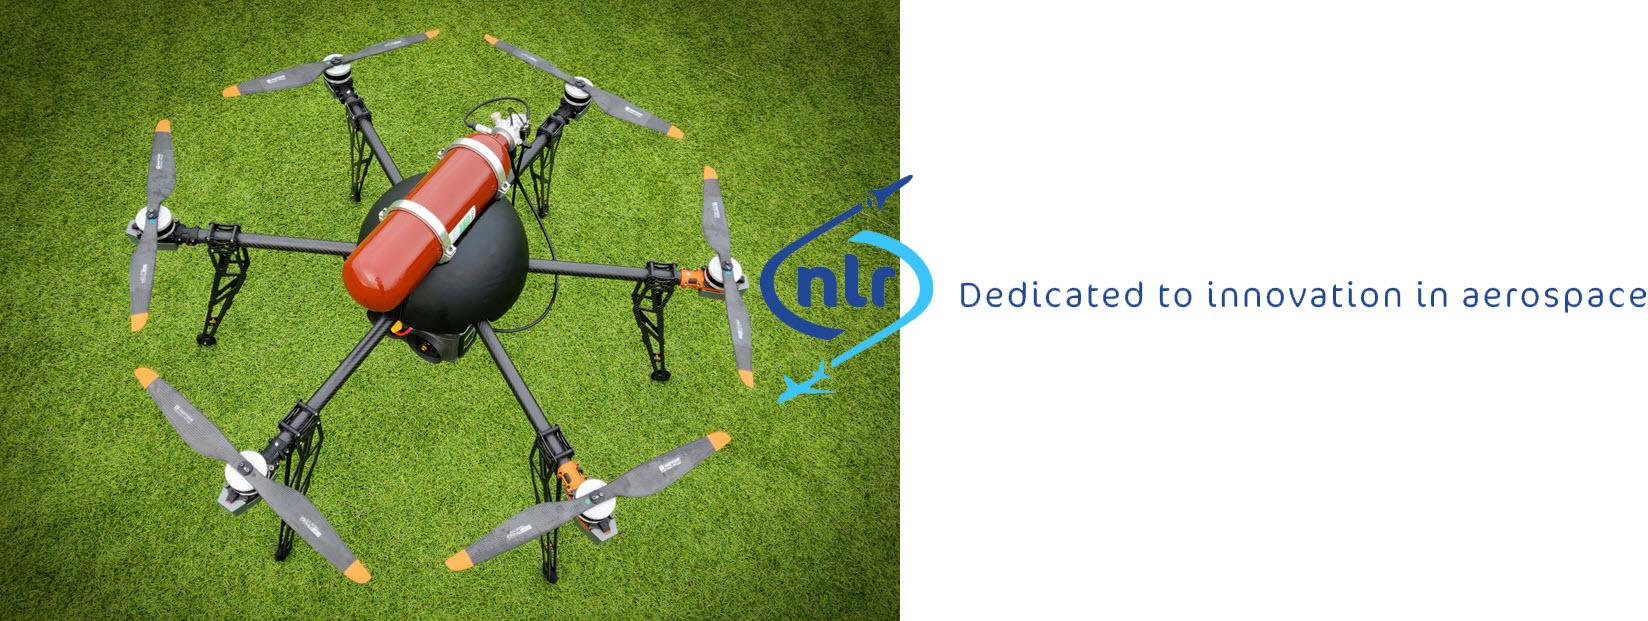 NLR hydrogen drone 1